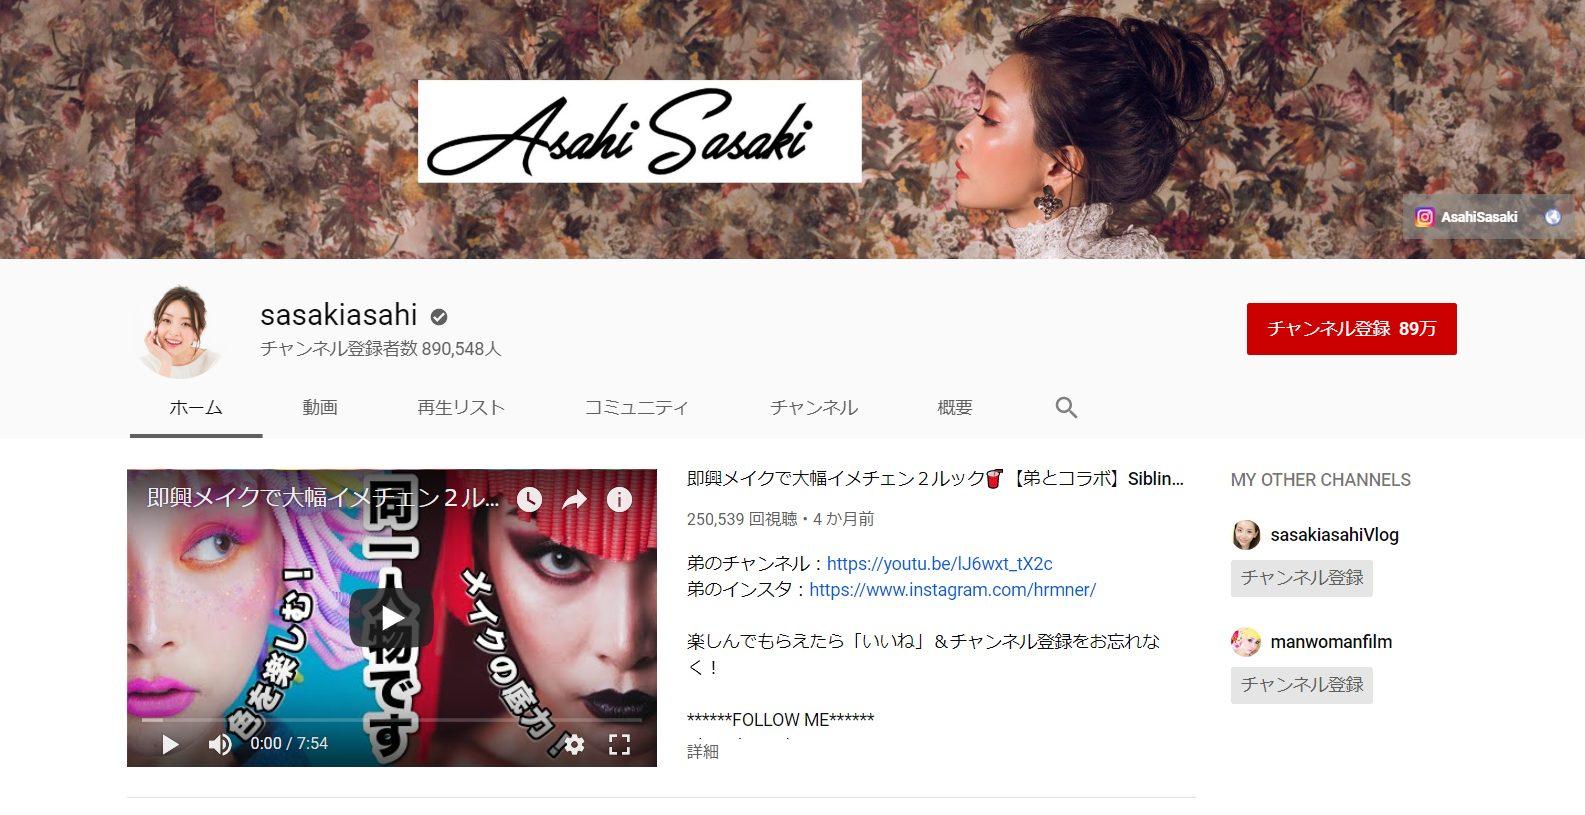 beauty-cosmetic-youtube-channel-sasaki-asahi